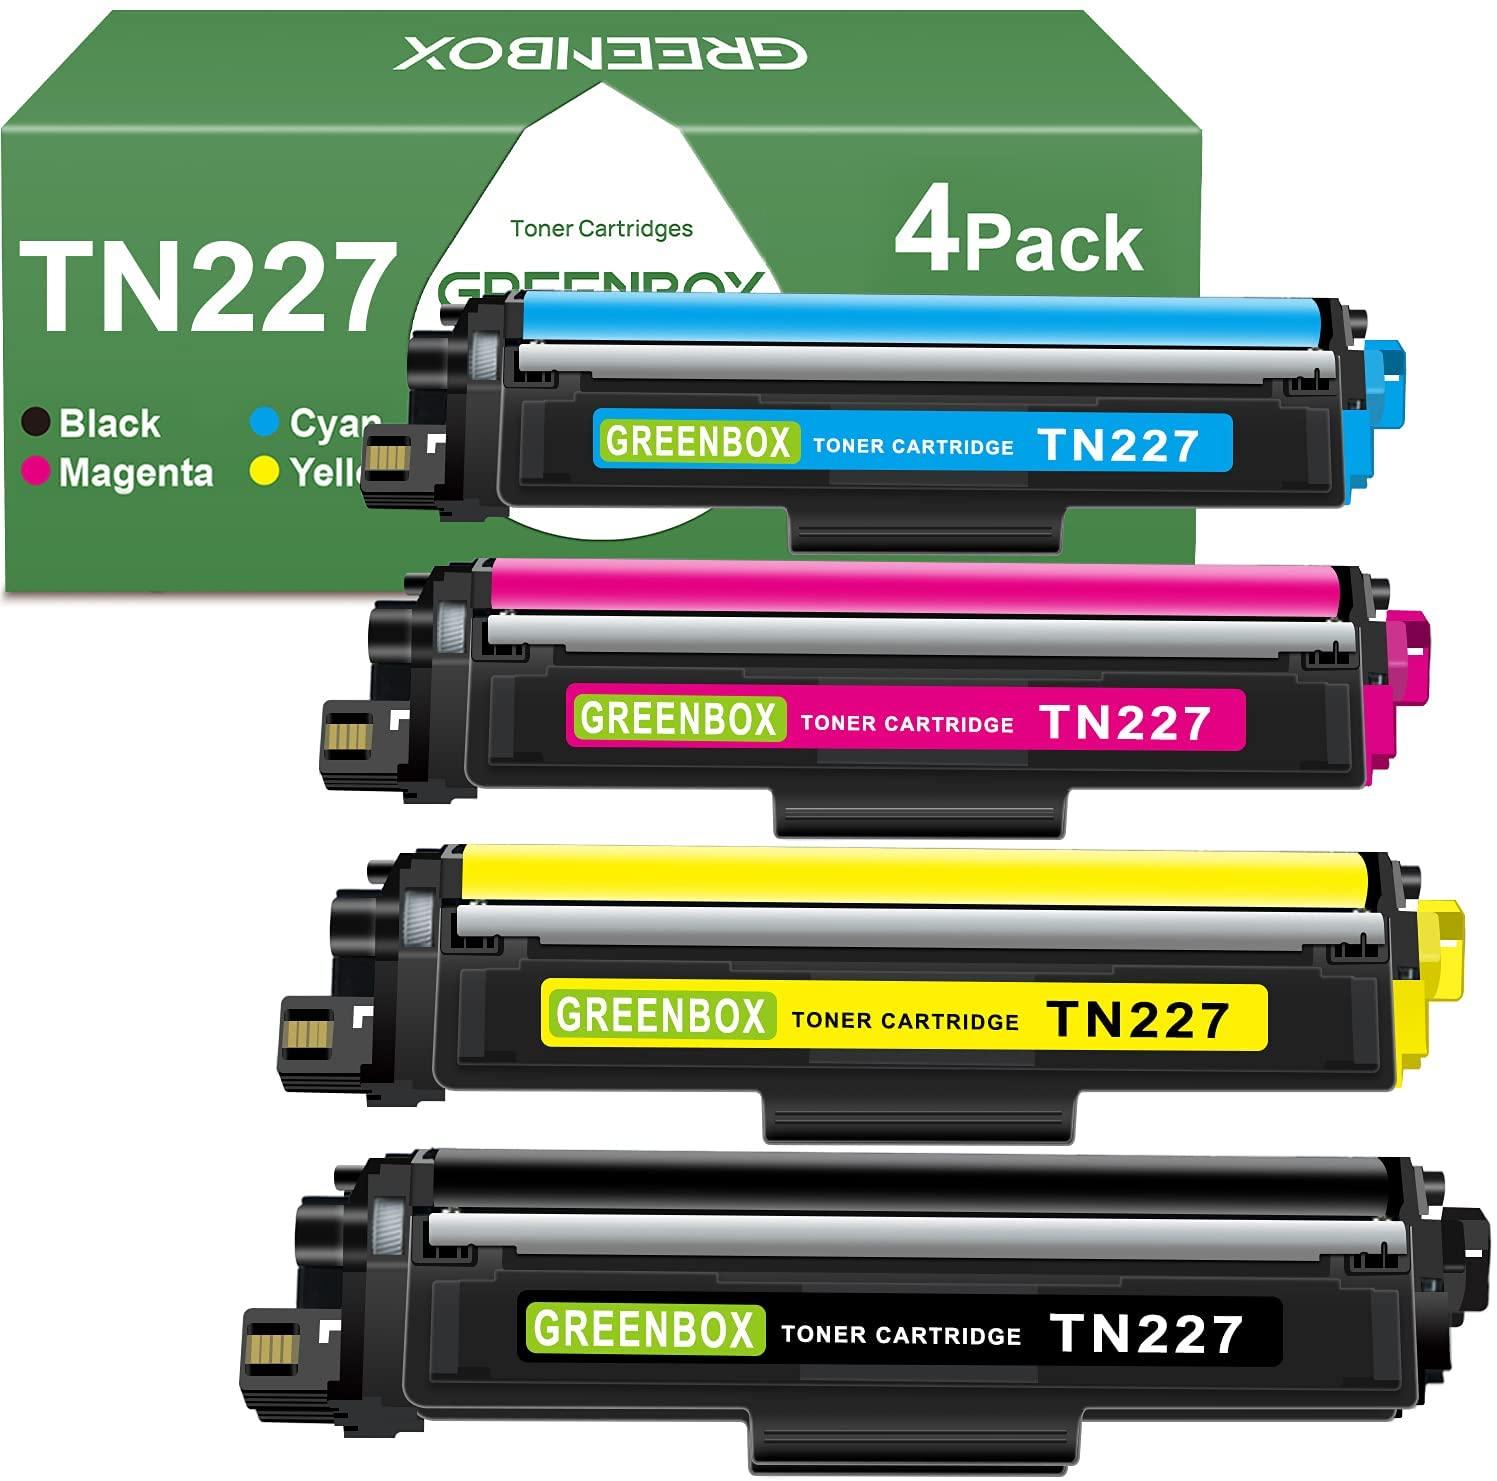 Amazon.com: Compatible Toner Cartridge Replacement for Brother TN227 TN-227 TN227BK TN223 TN-223 for HL-L3210CW HL-L3230CDW HL-L3270CDW HL-L3290CDW MFC-L3710CW $29.99